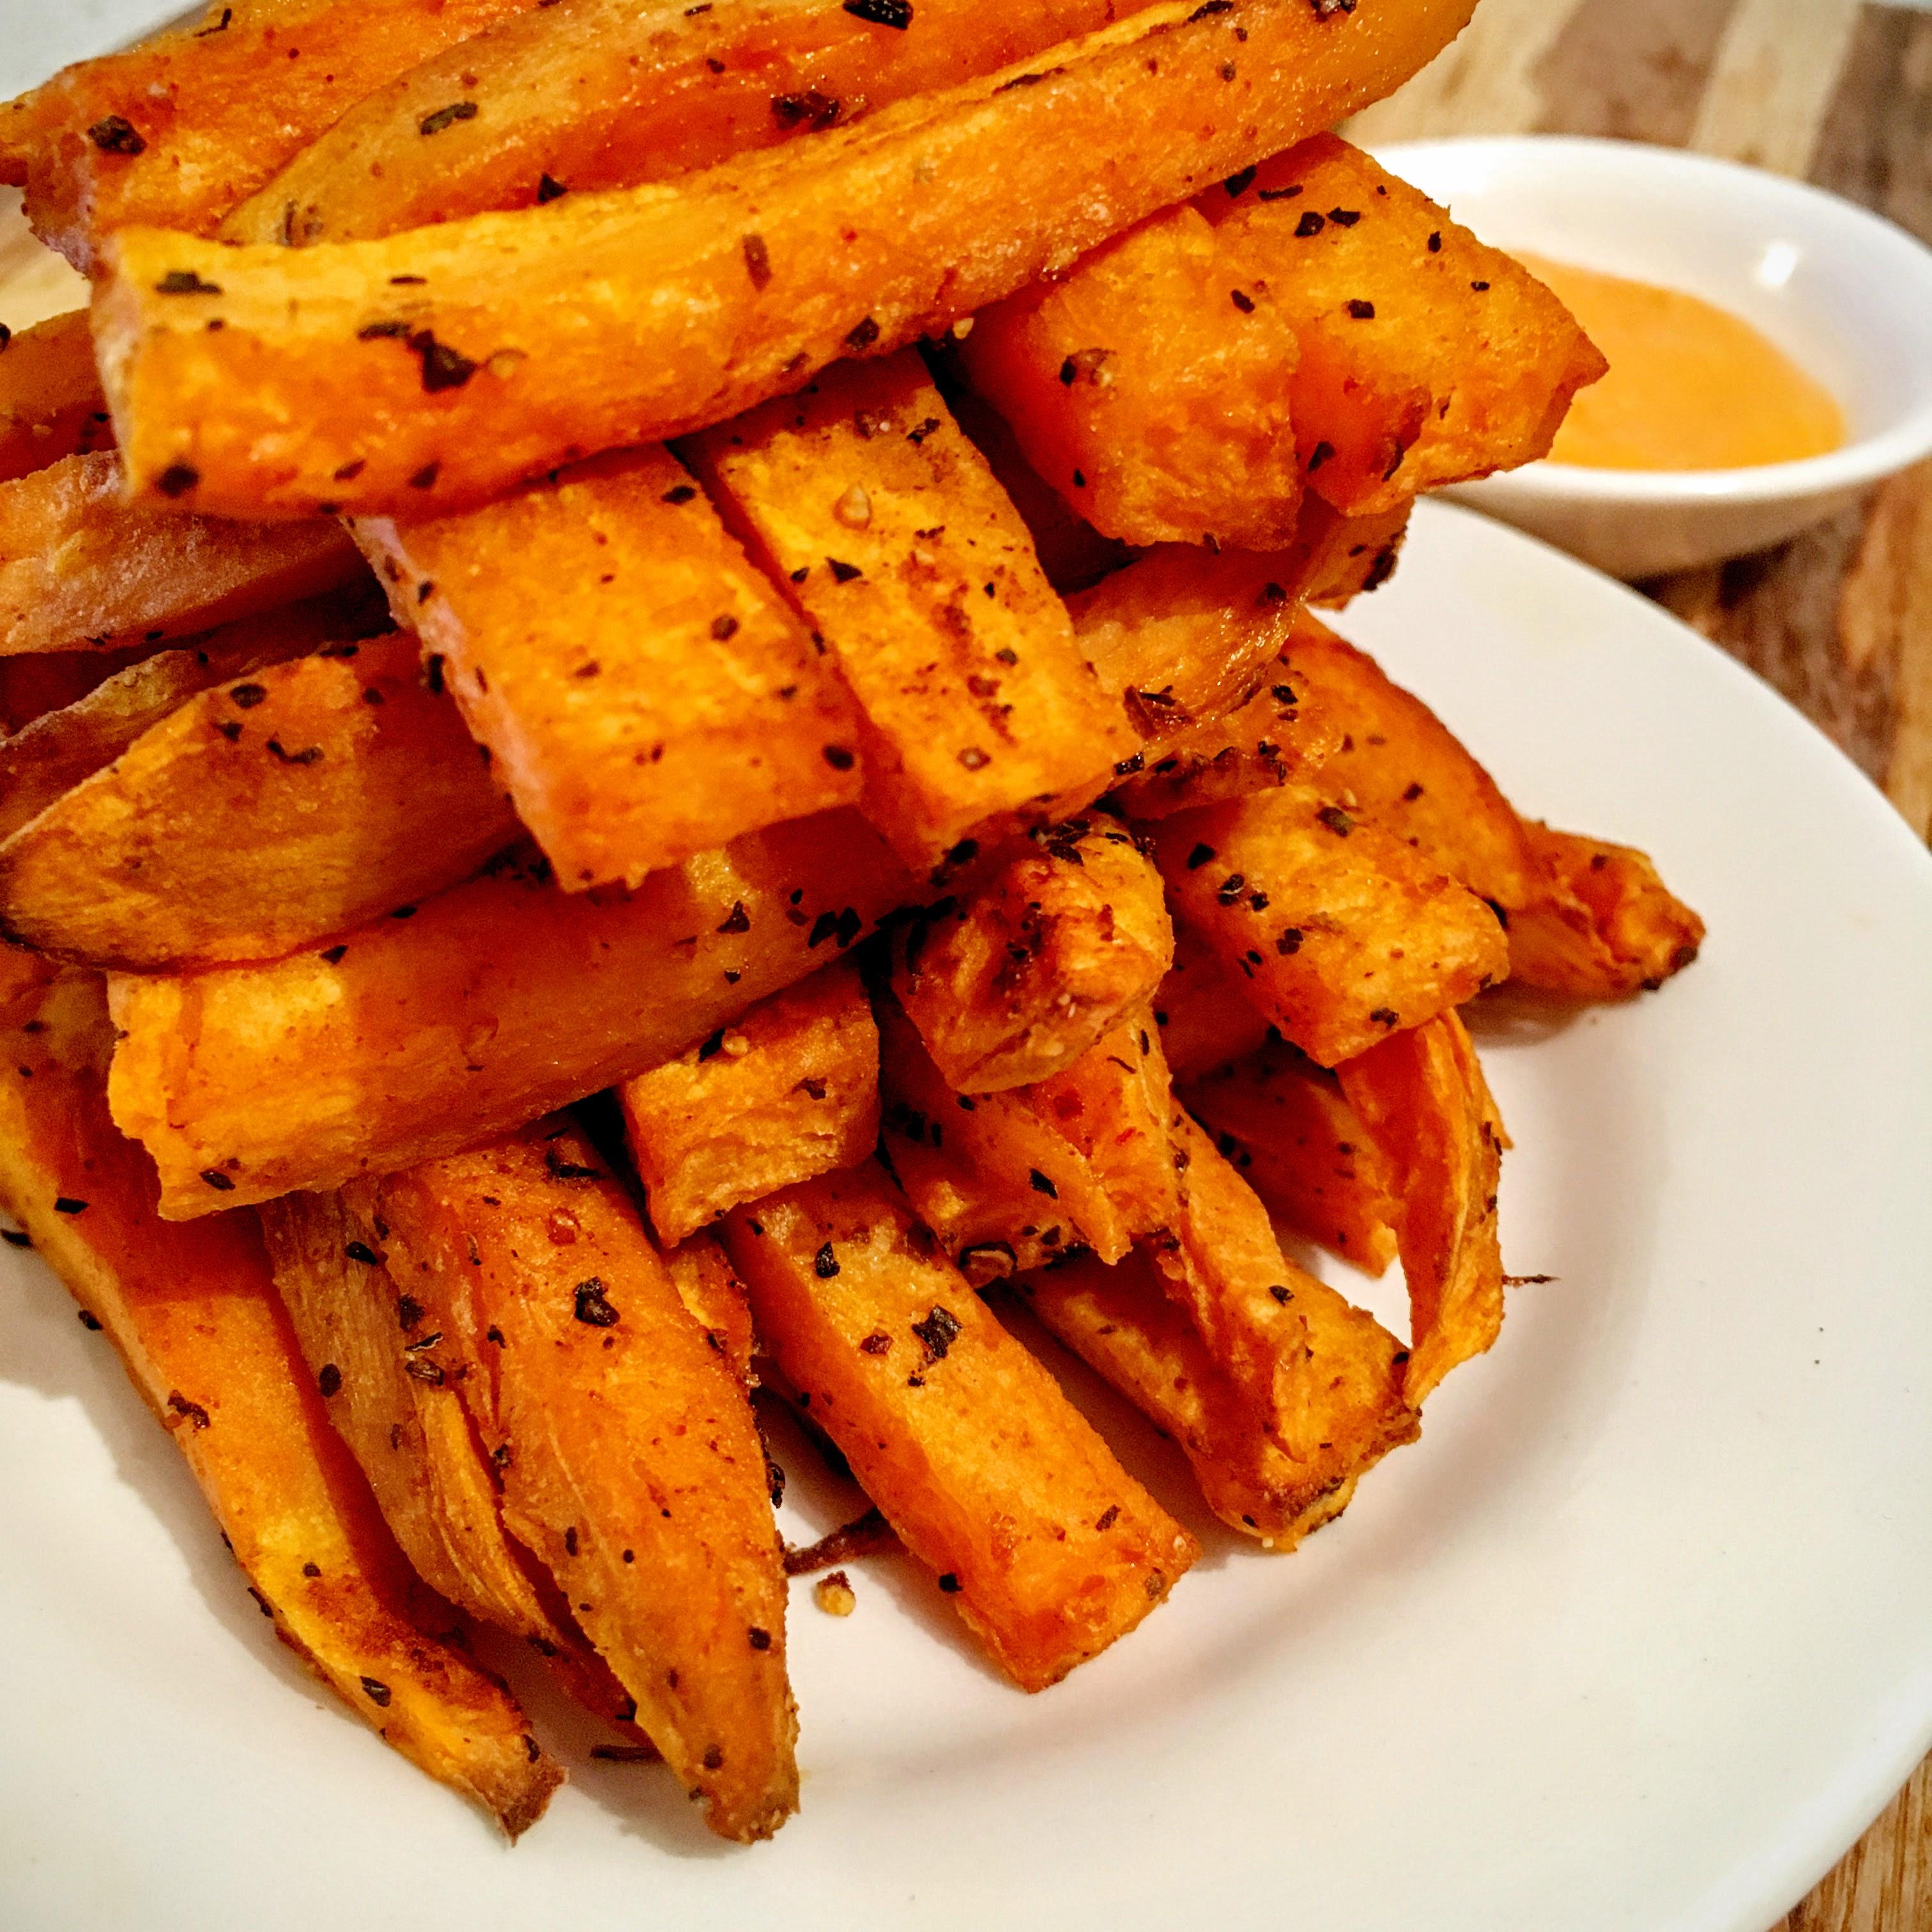 Sweet Potato Fries - baked with sriracha mayonnaise dip